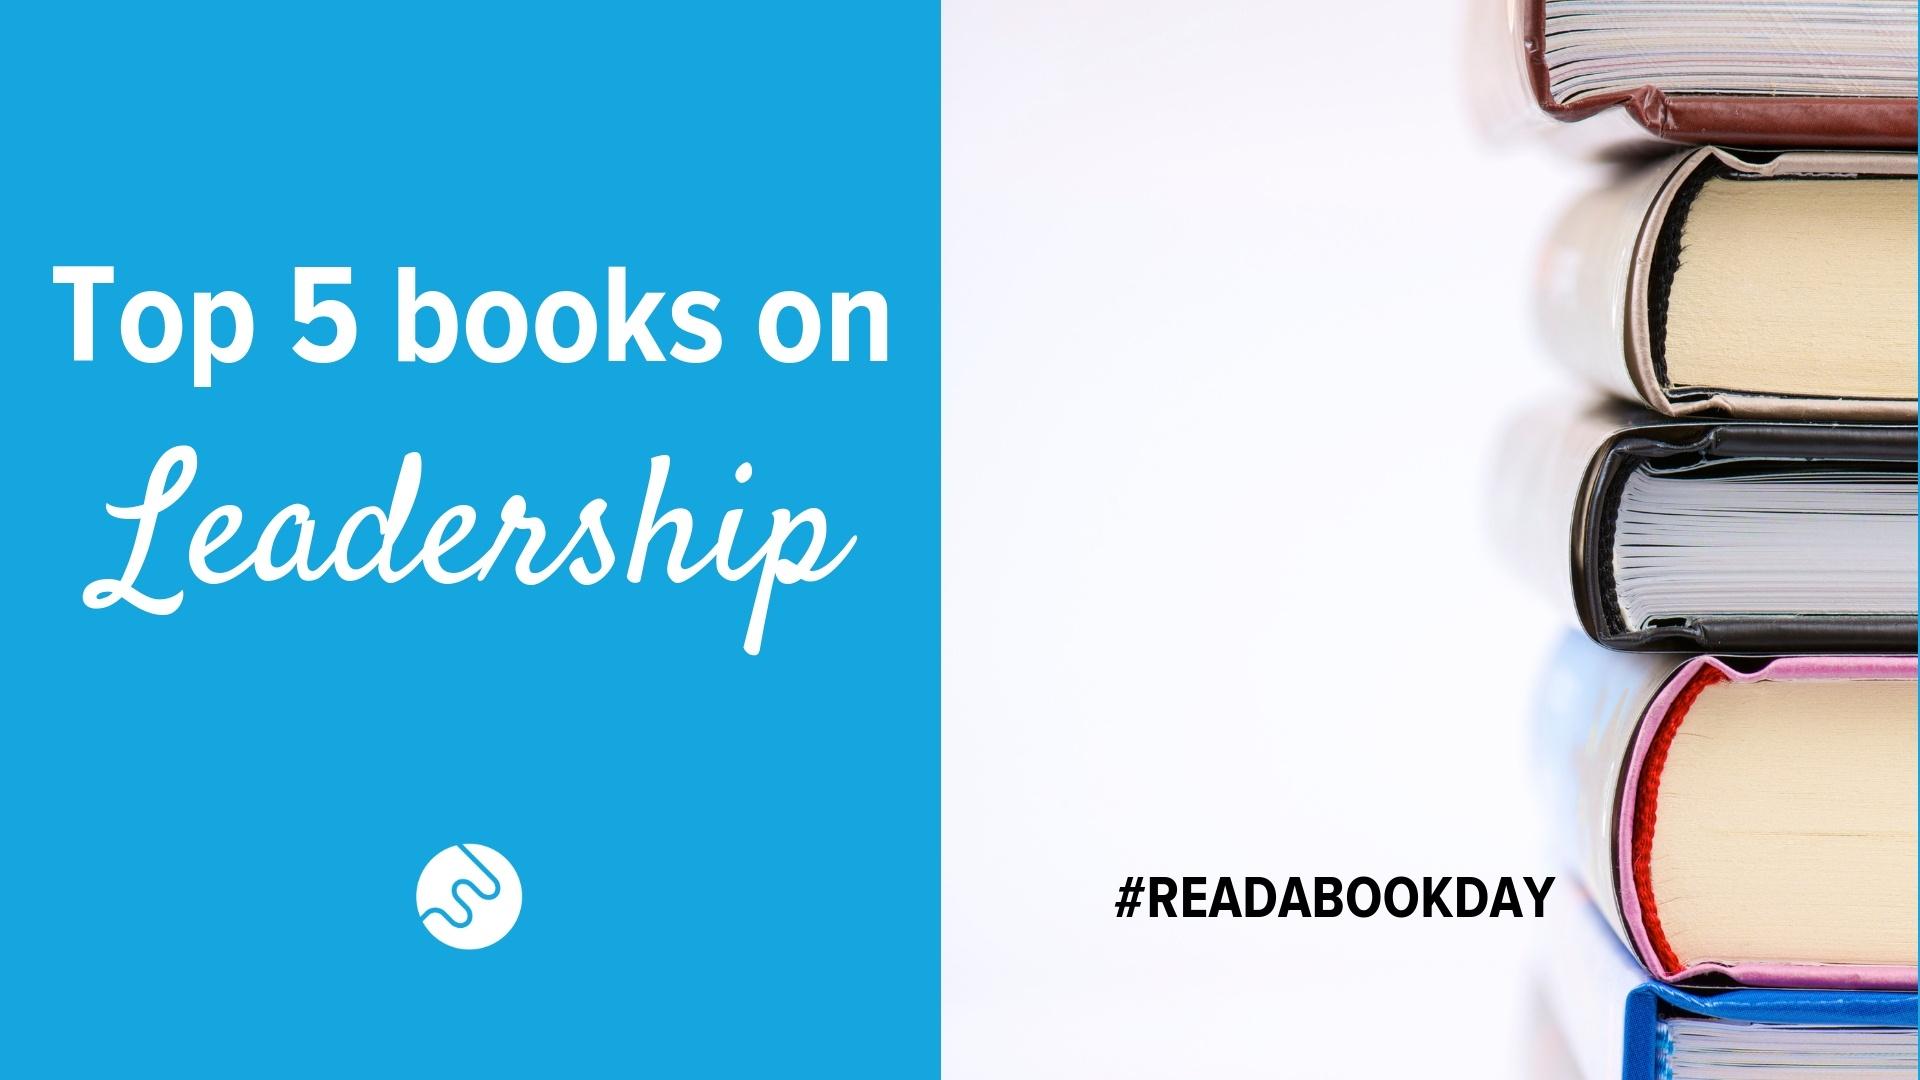 Top 5 Books 1.1